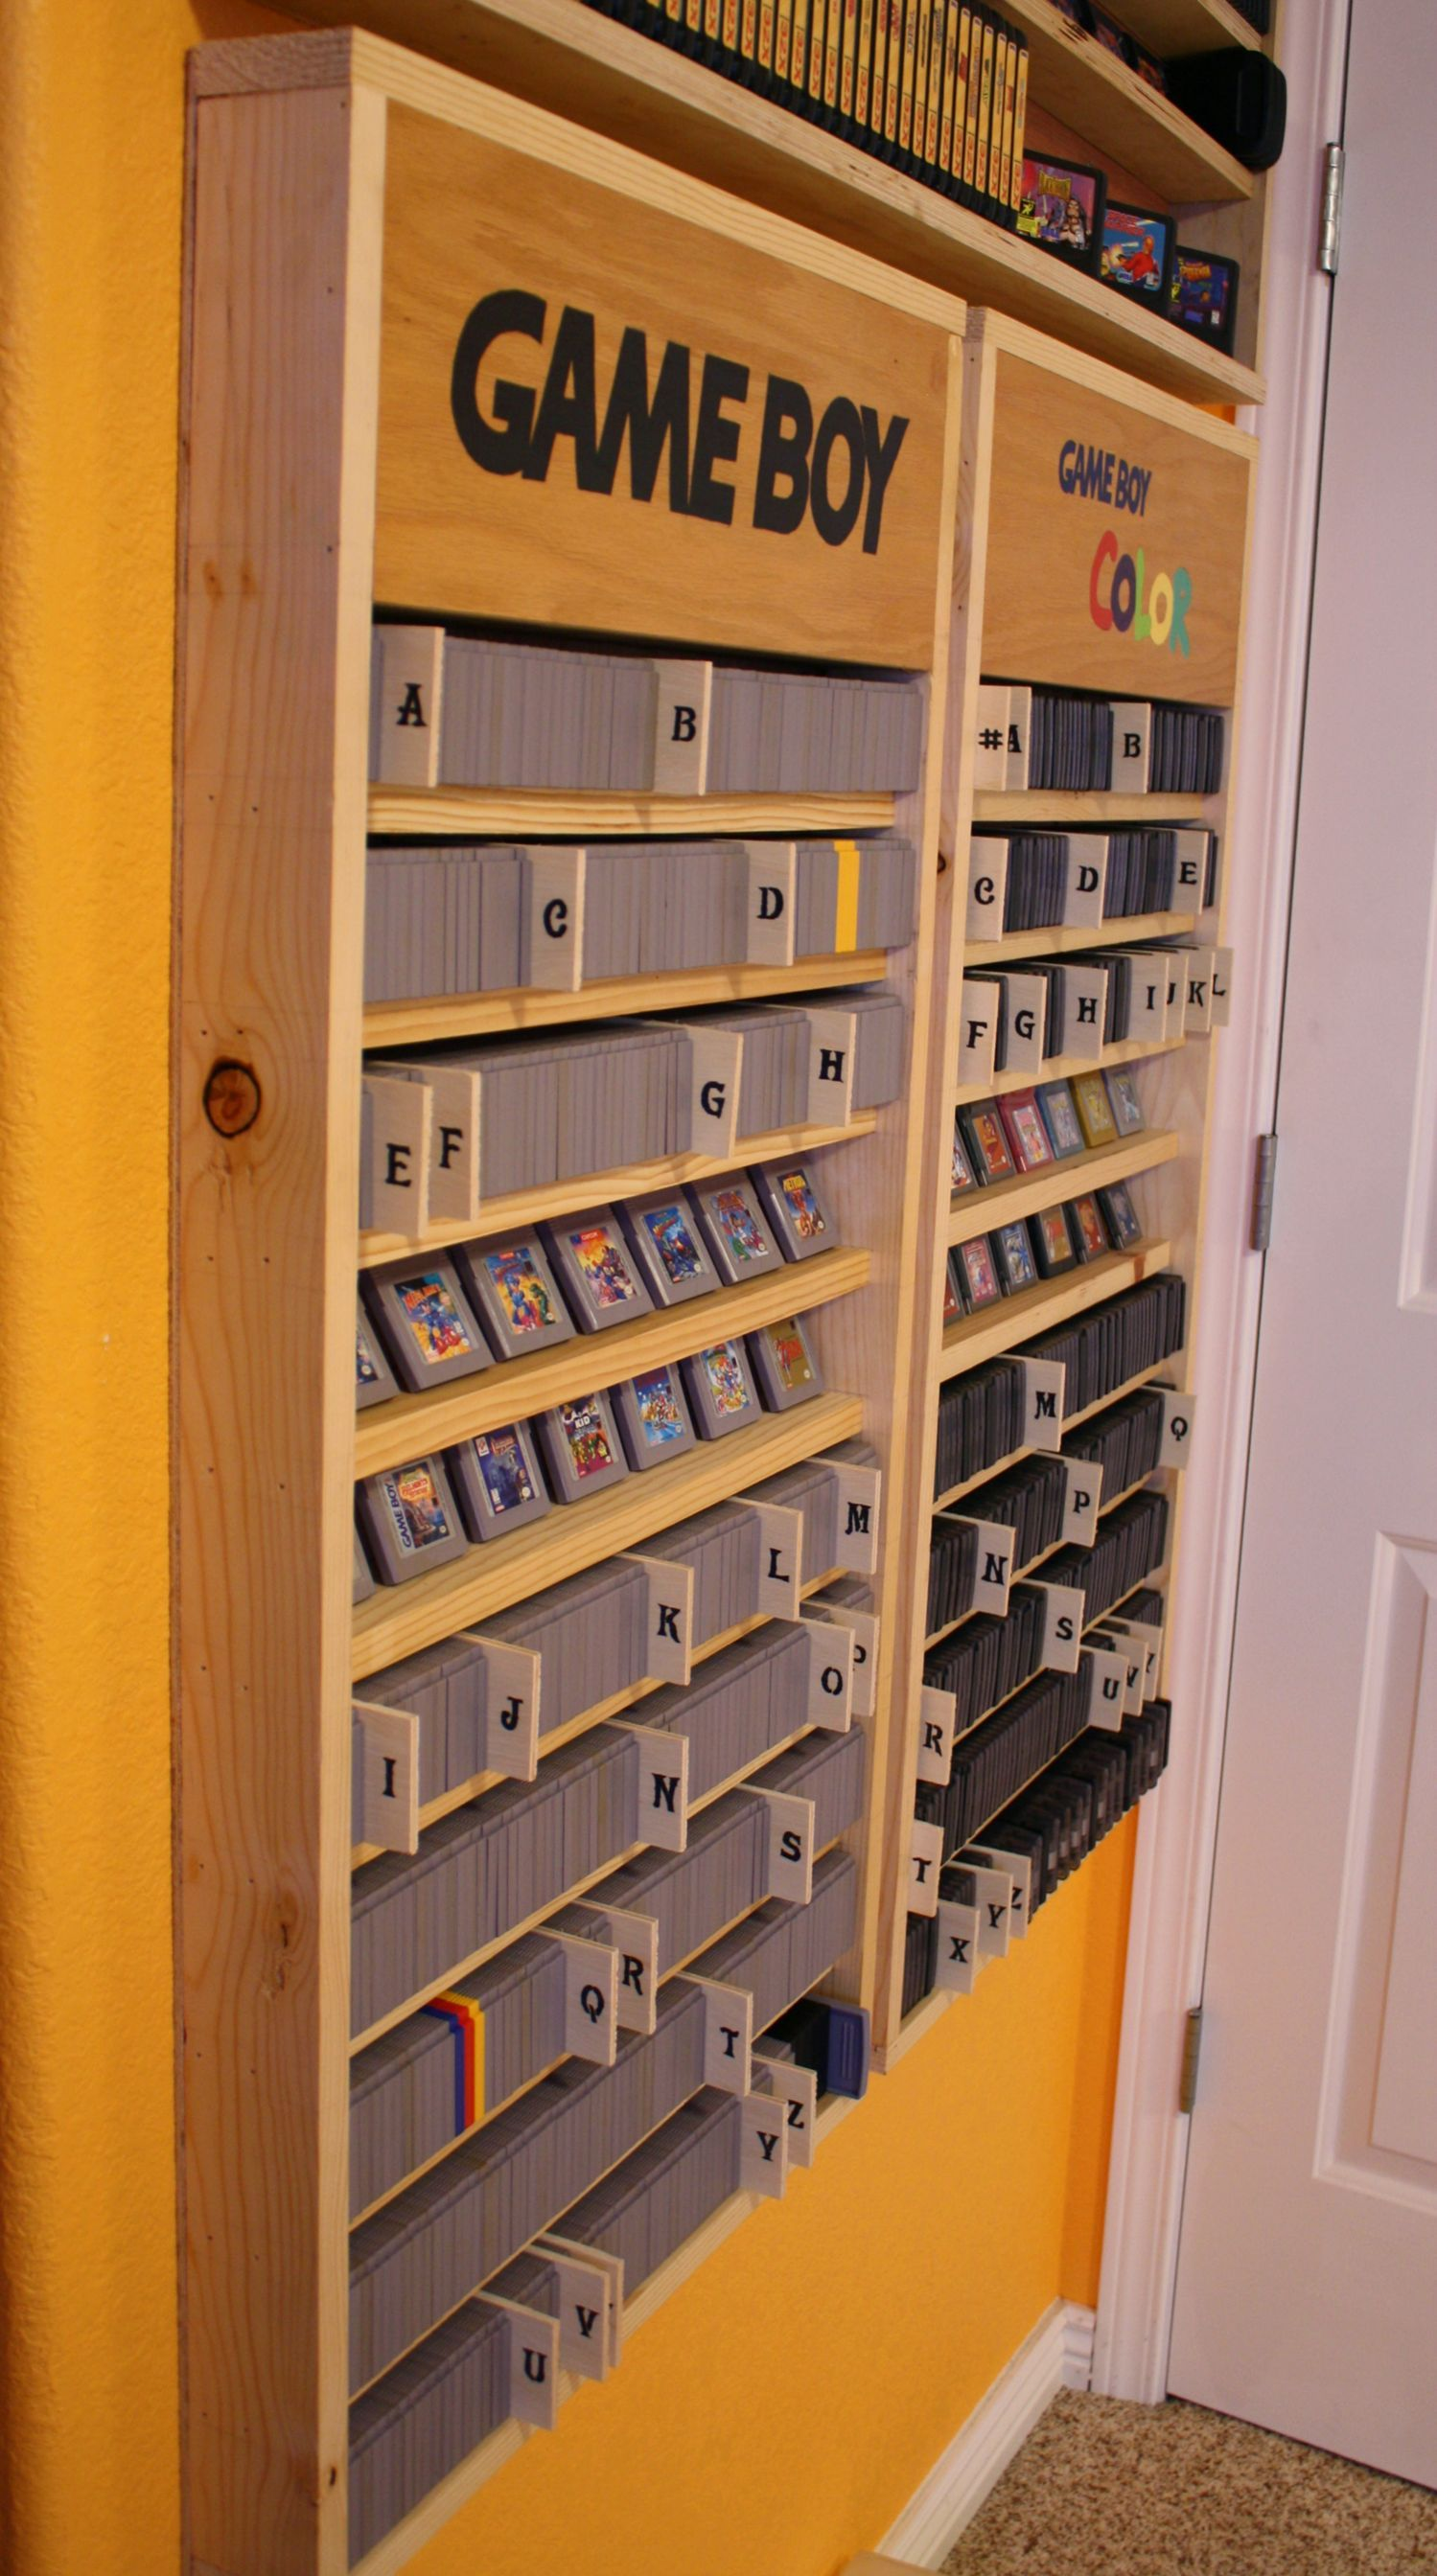 Blue apron alternatives reddit - Alphabetical Retro Game Organization Nintendo Game Boy And Gb Color Shelves Via Reddit User